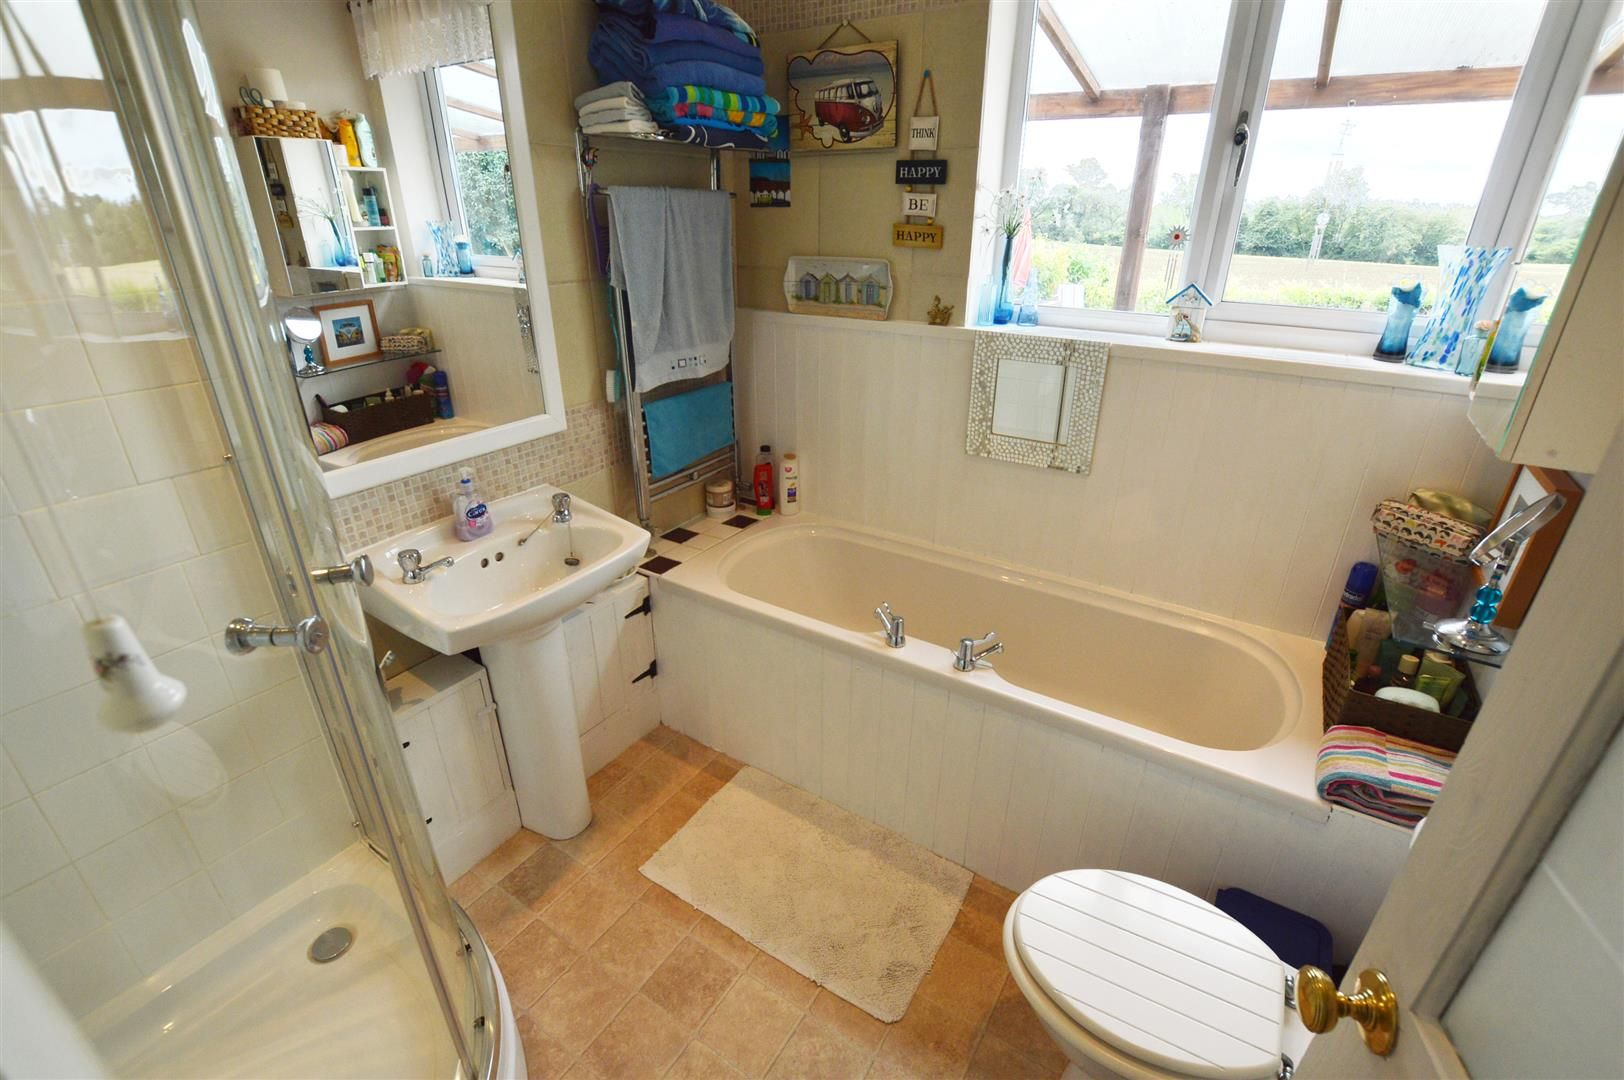 3 bed semi-detached-bungalow for sale in Shobdon 7